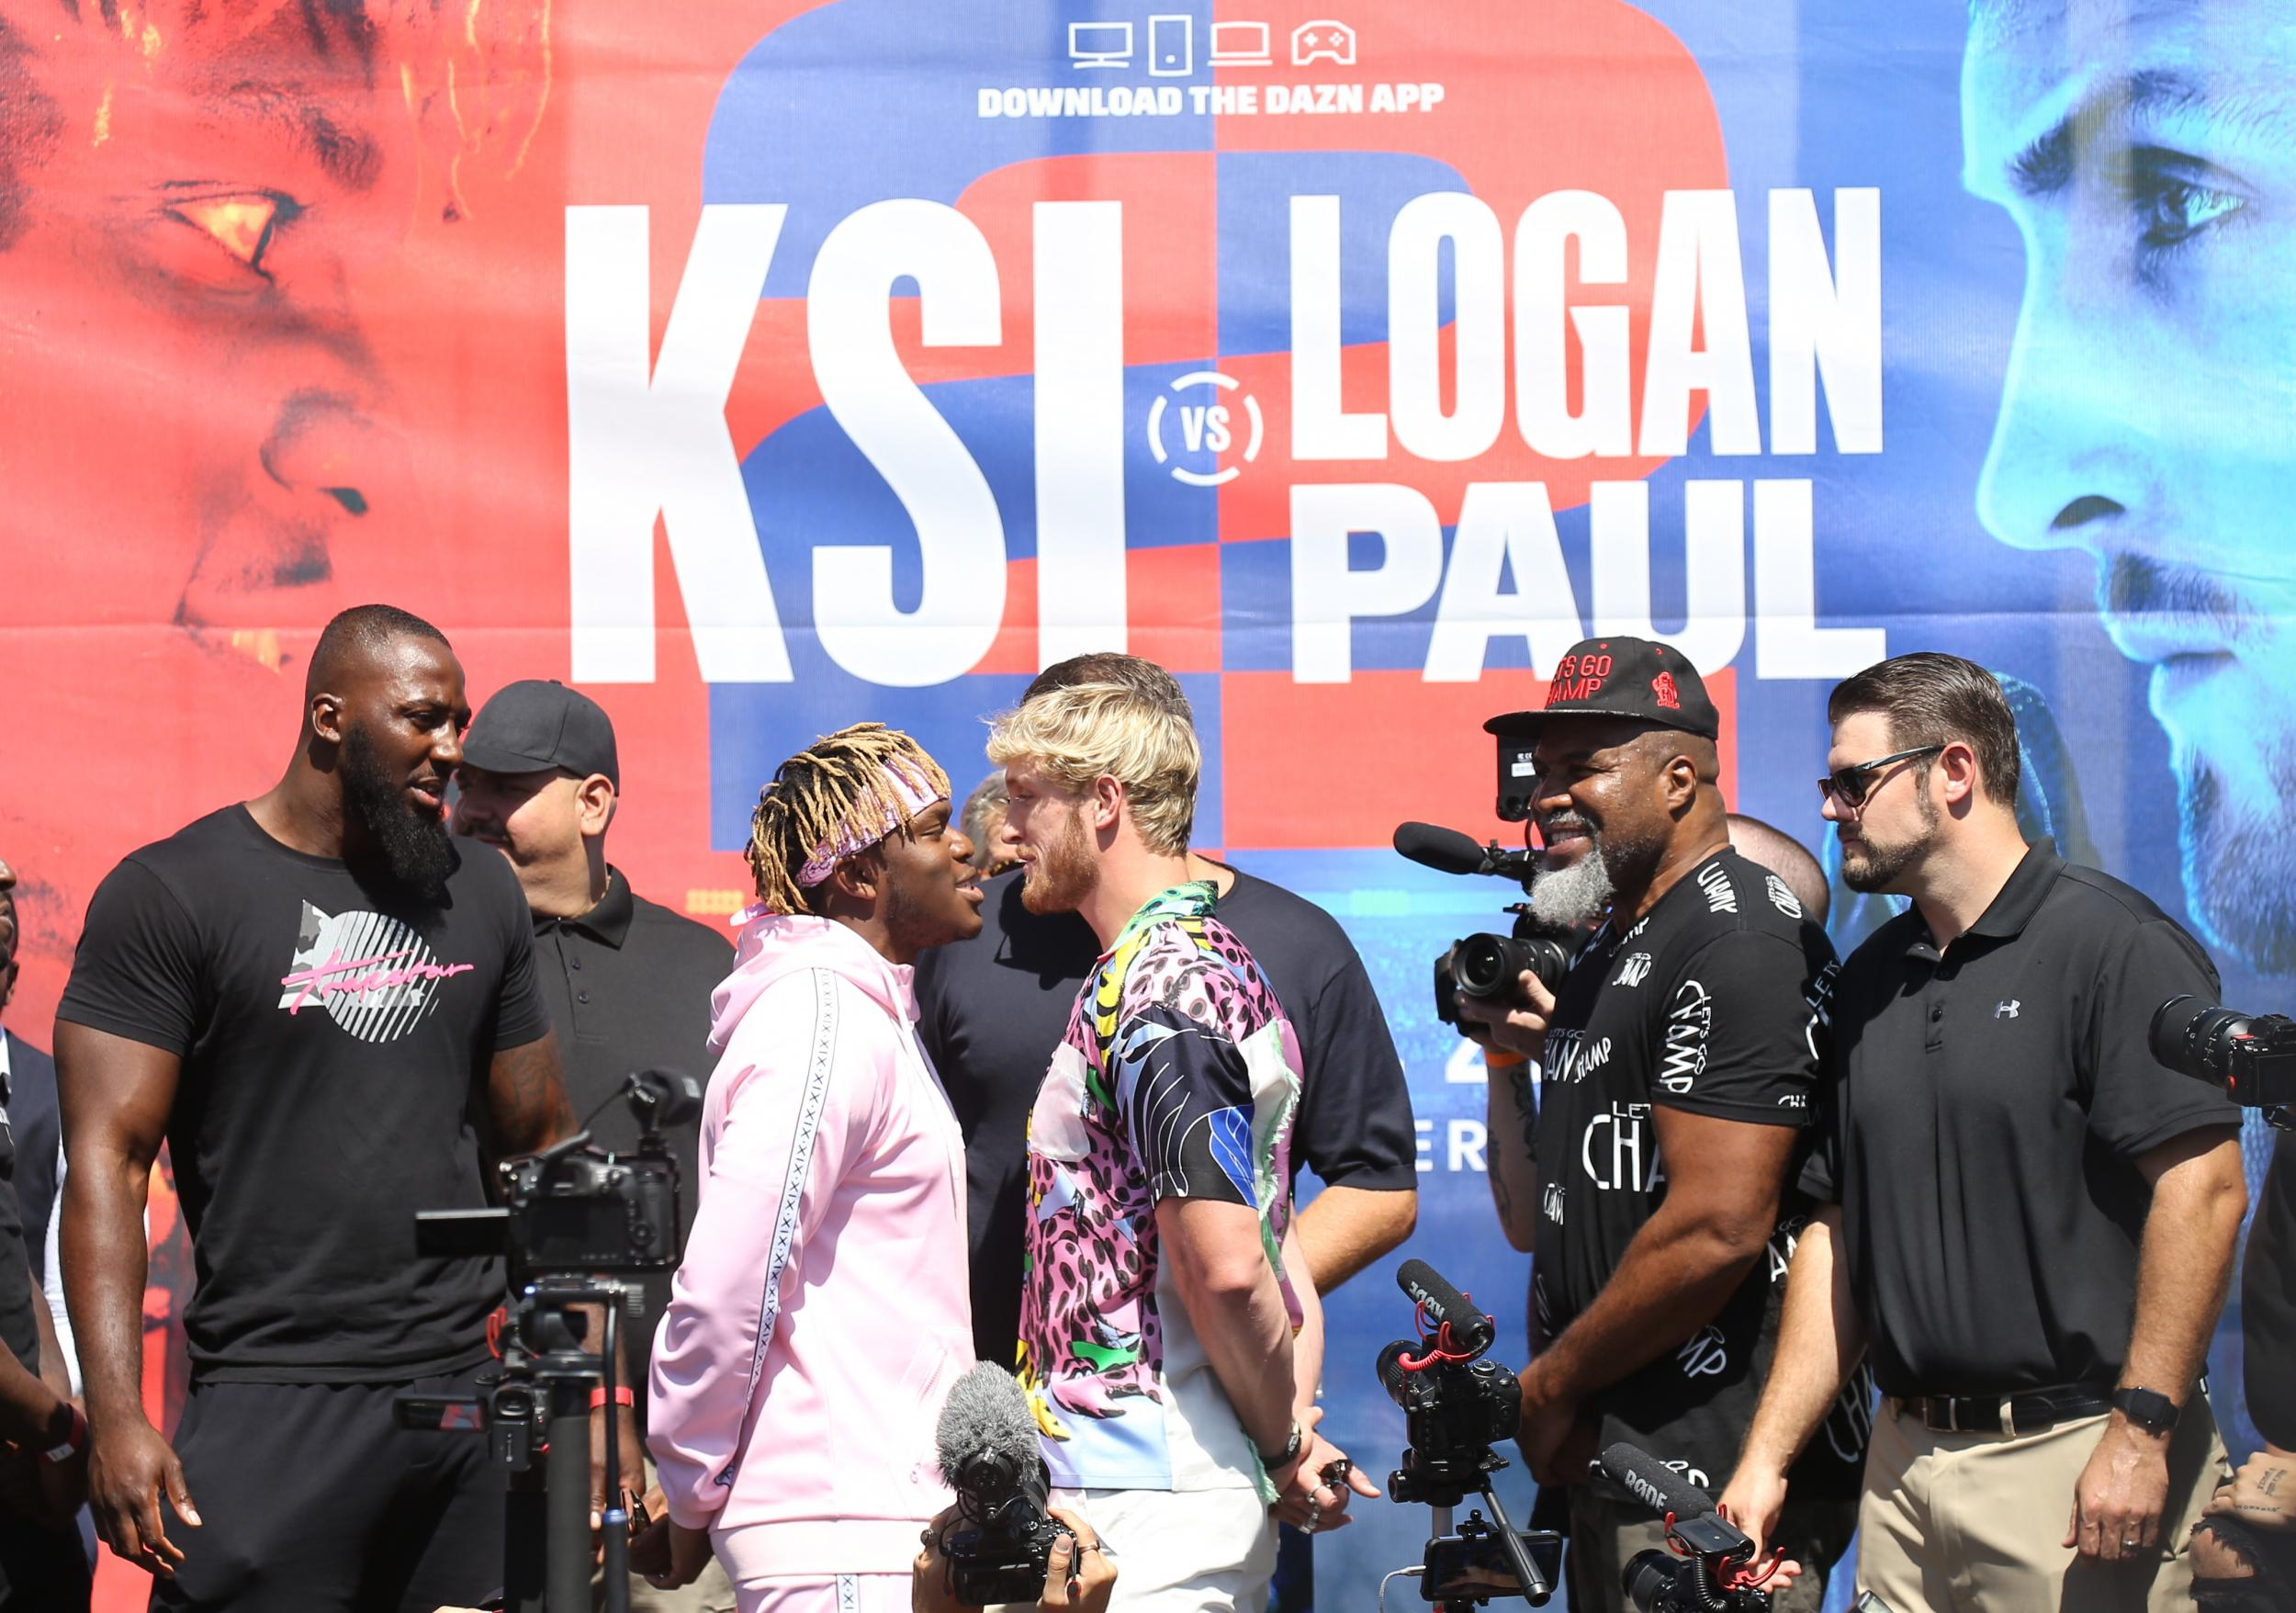 KSI vs Logan Paul: Anthony Joshua predicts who will win rematch